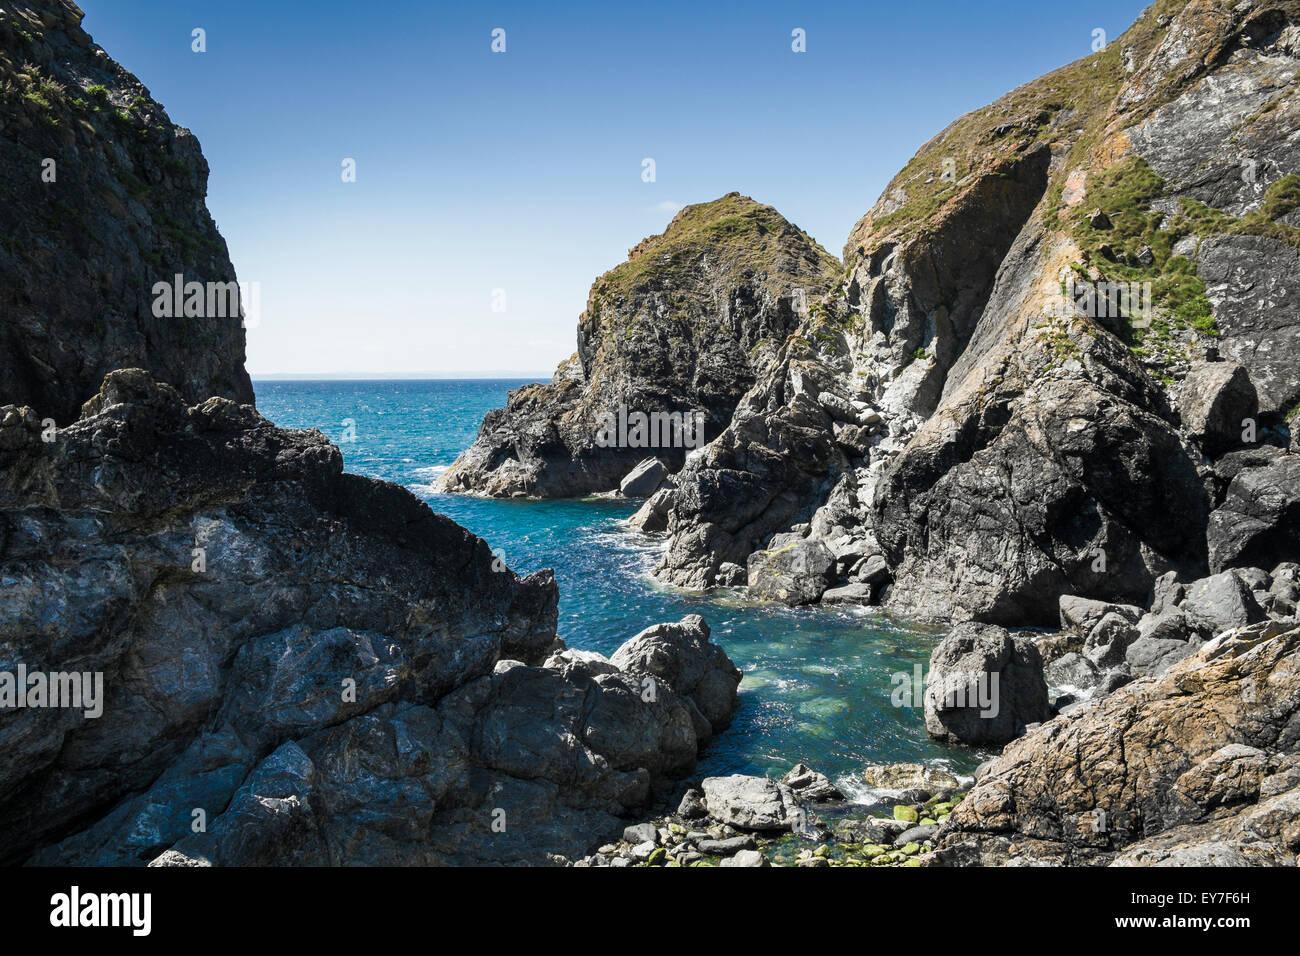 Küste Cornwalls - Felsen und Landzunge am Mullion Cove, Halbinsel Lizard, Cornwall, England, UK Stockbild